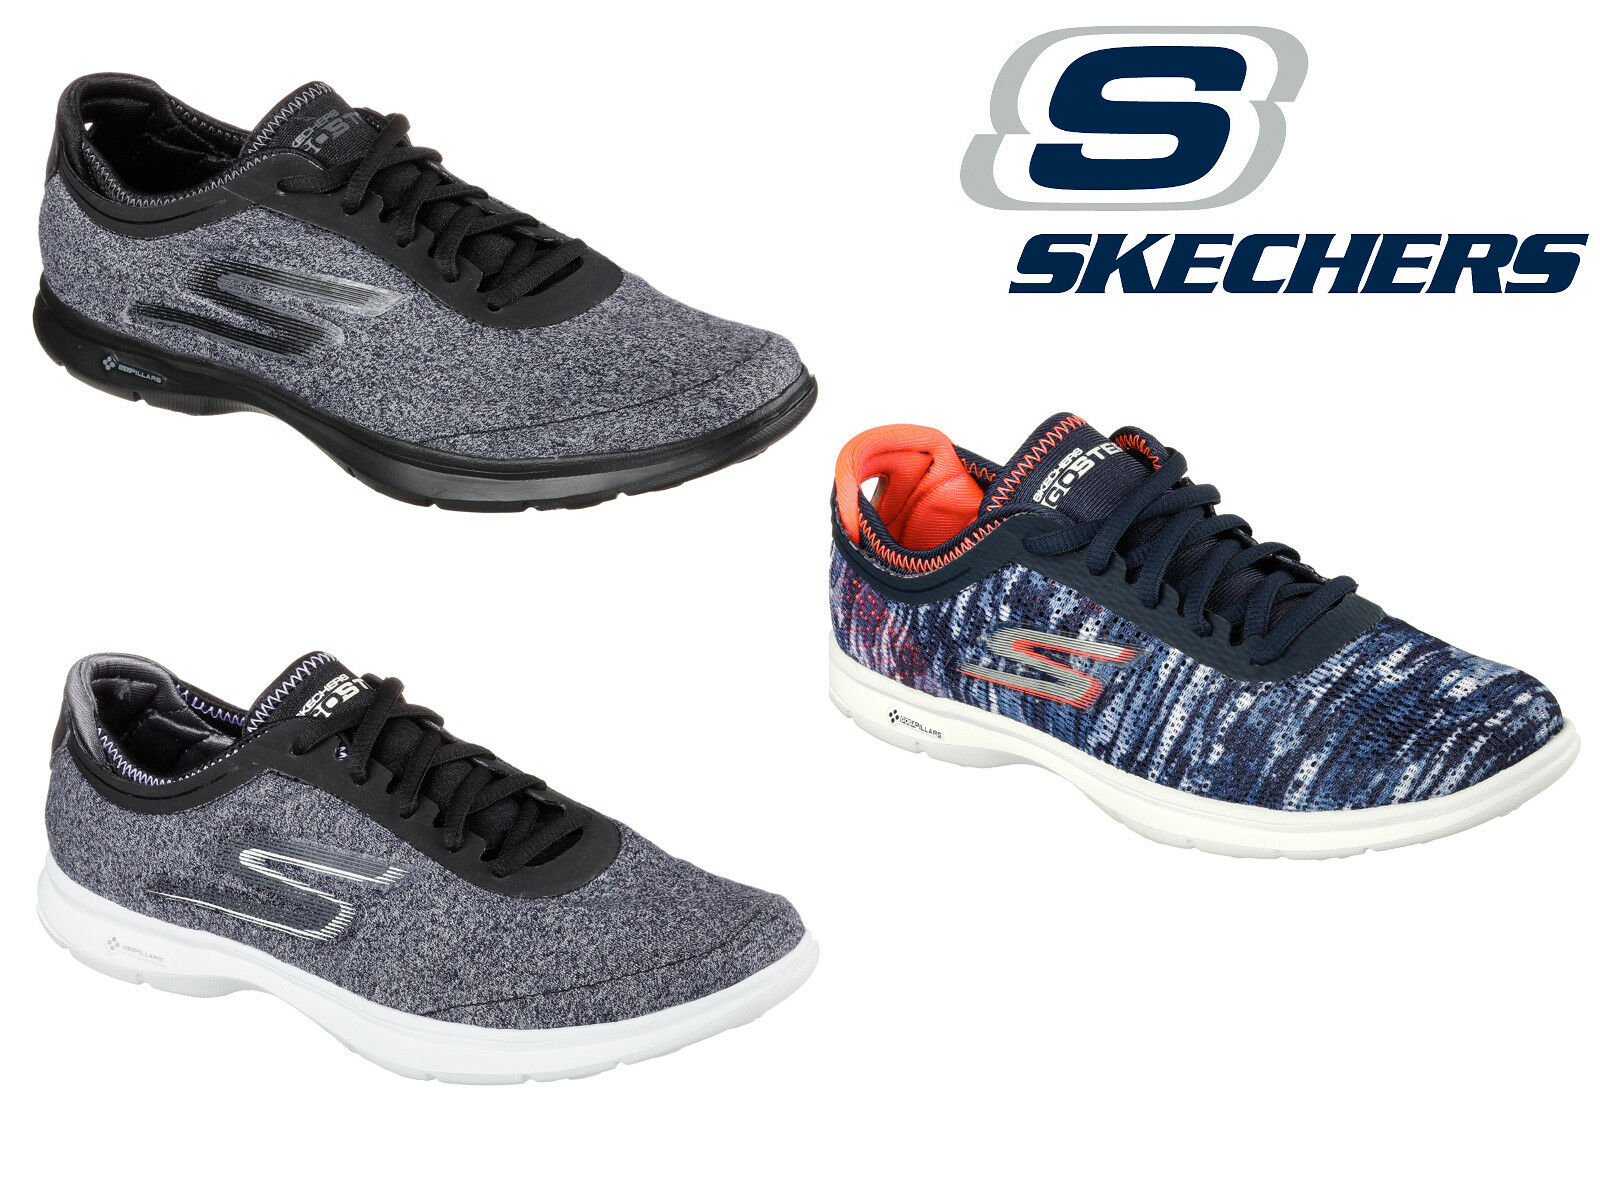 NEU Damenschuhe Skechers Casual Running Lace up gym Trainer shoe Größe 3-8